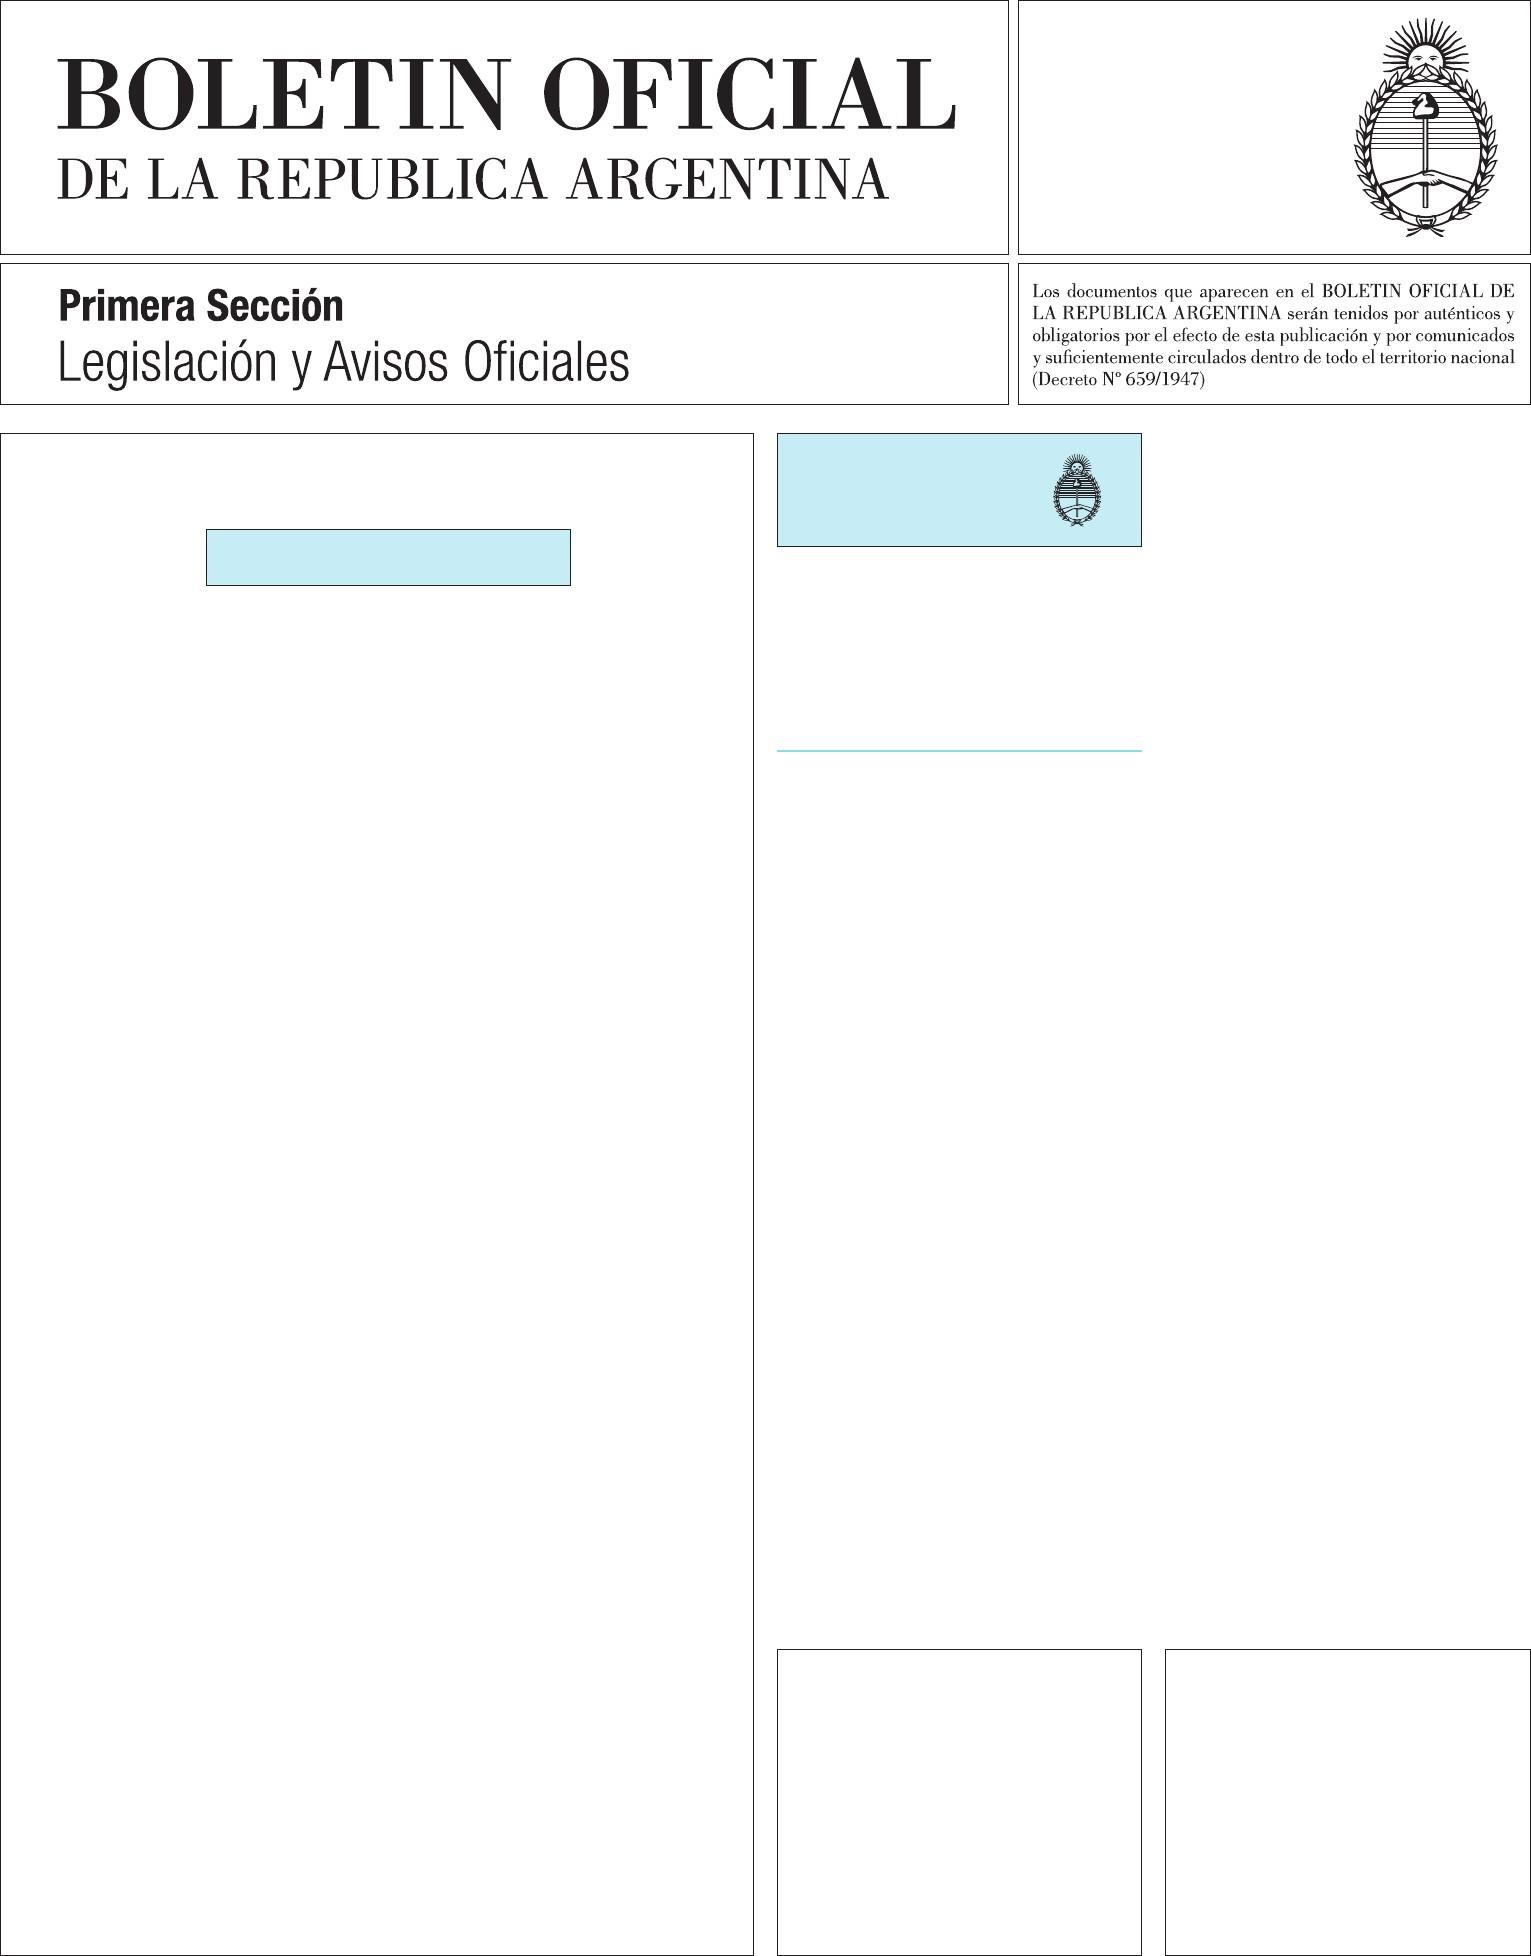 Boleto electr³nico Boletn icial [PDF Document]